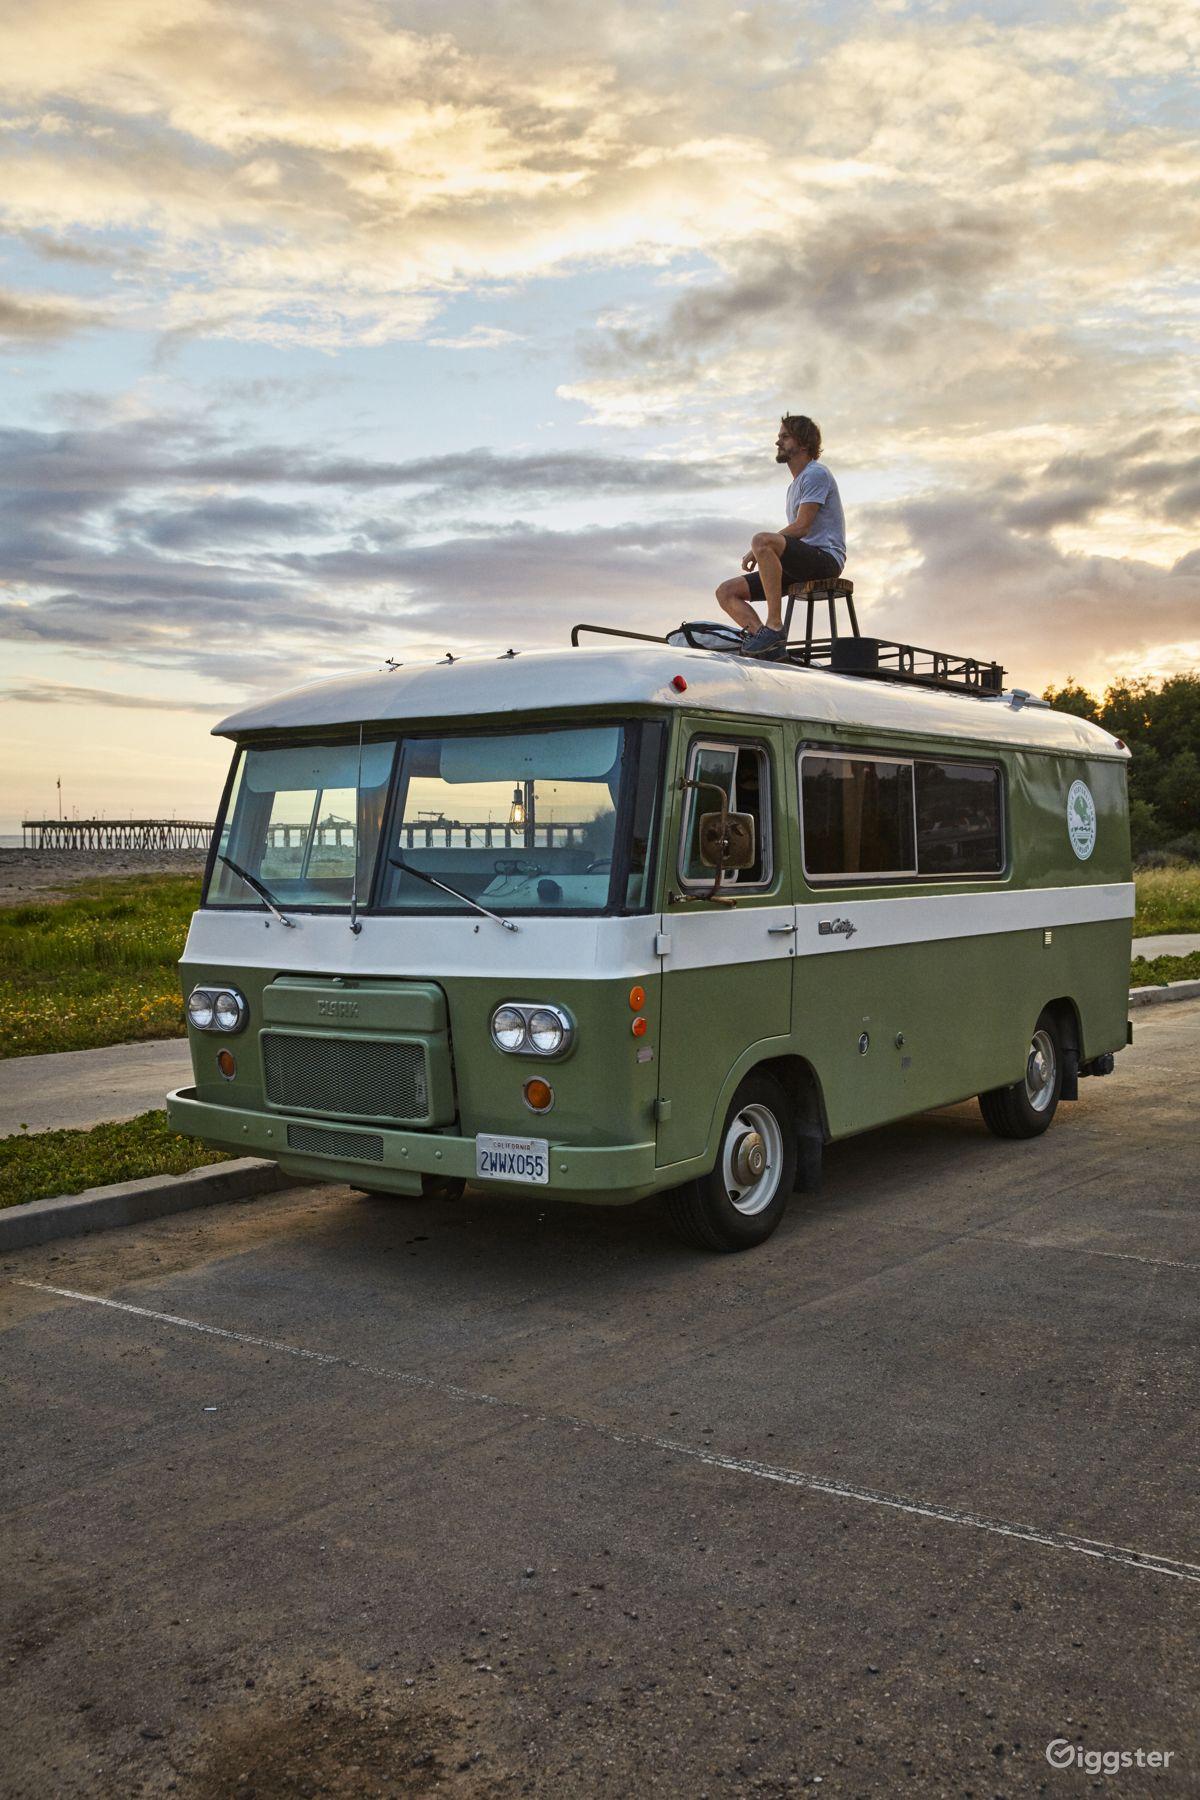 Rent The Van Bus RVtransportation Unforgettable 1966 Clark Cortez Vintage Camper